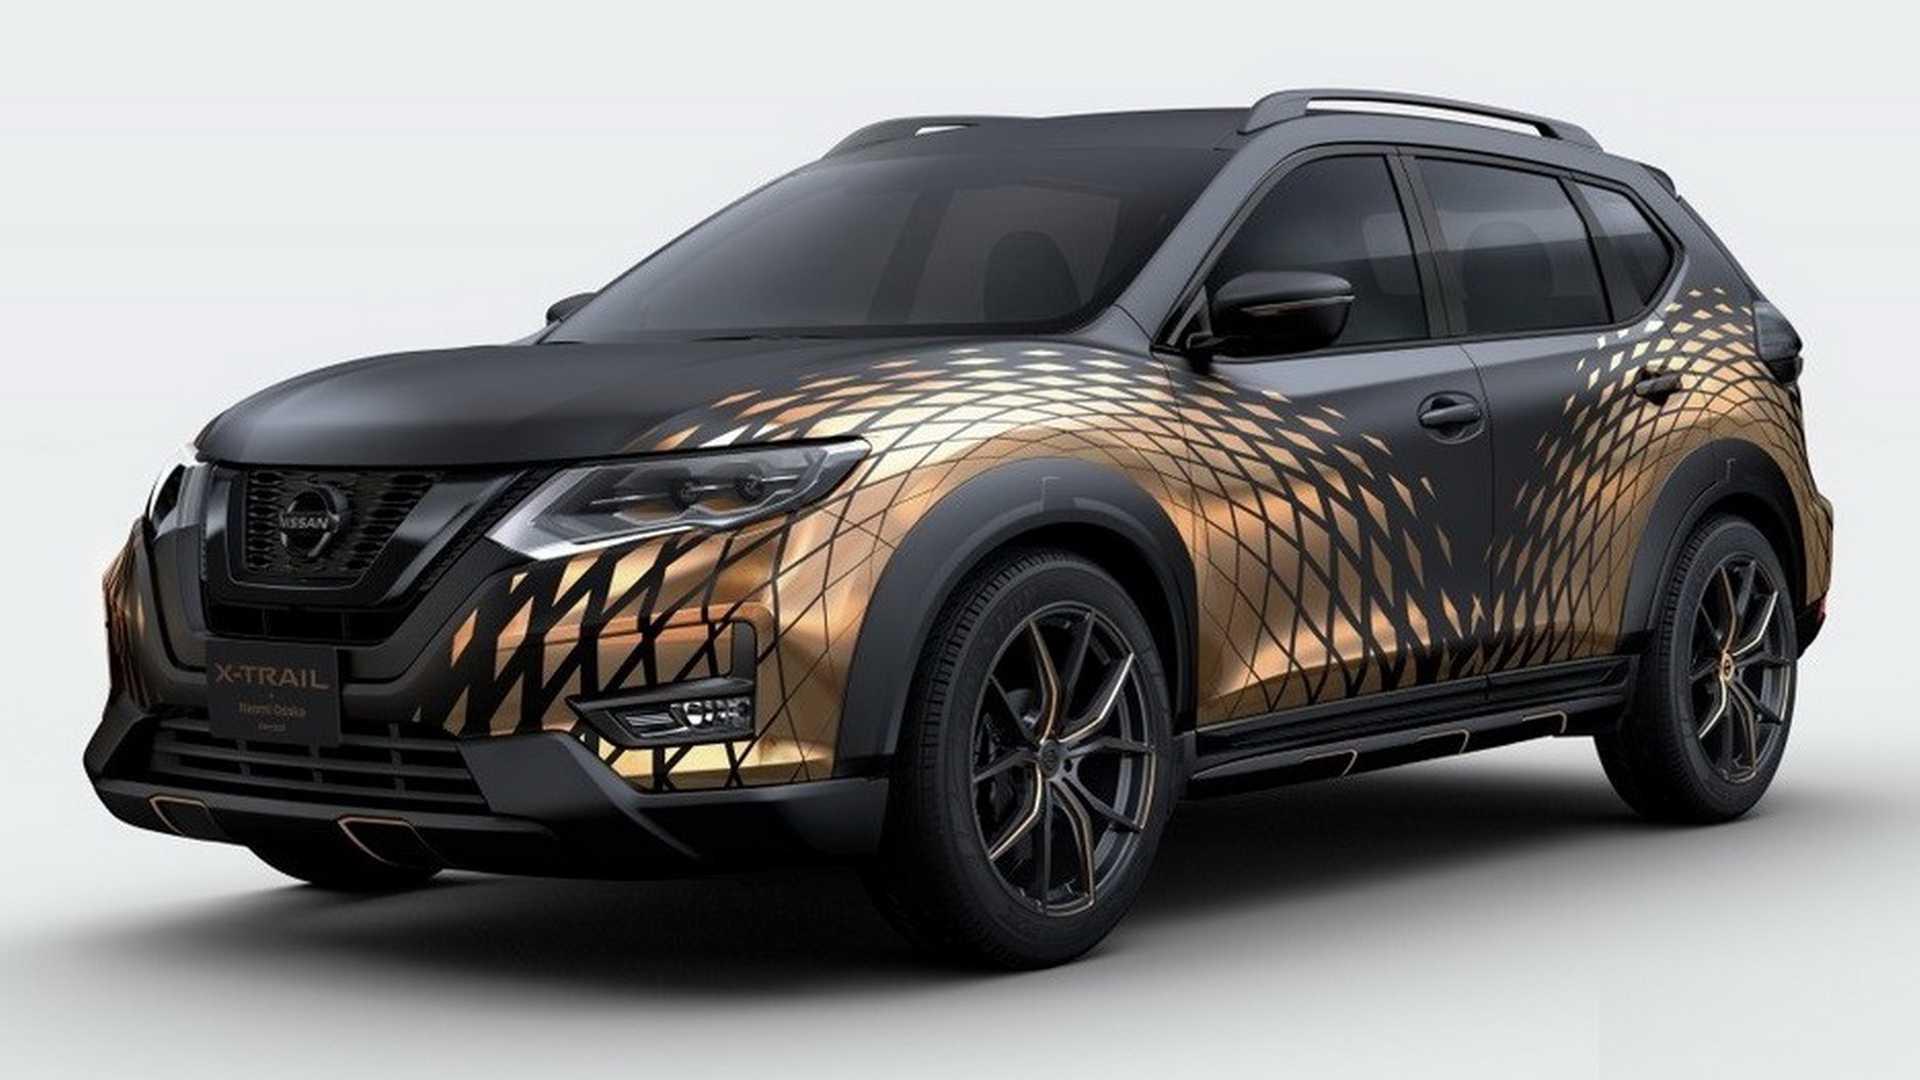 nissan-x-trail-naomi-osaka-concept Nissan Juke Snowmobile si alte exclusivitati se indreapta spre Salonul Auto Tokyo